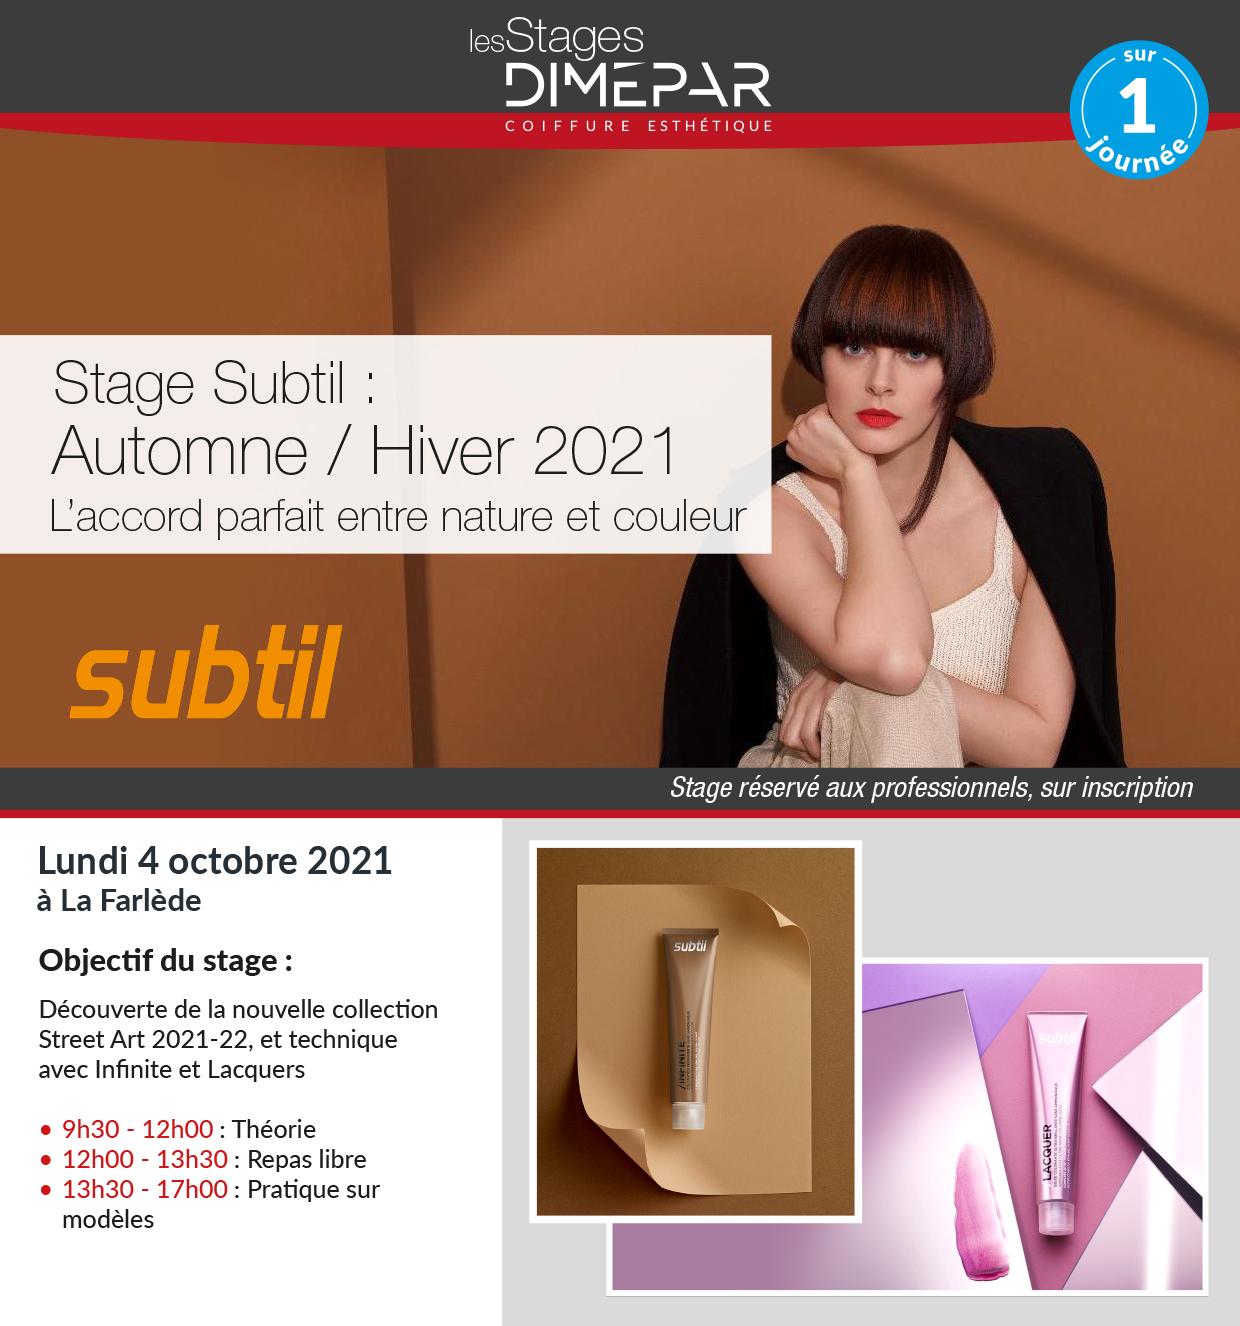 Stage Subtil Automne / Hiver 2021.